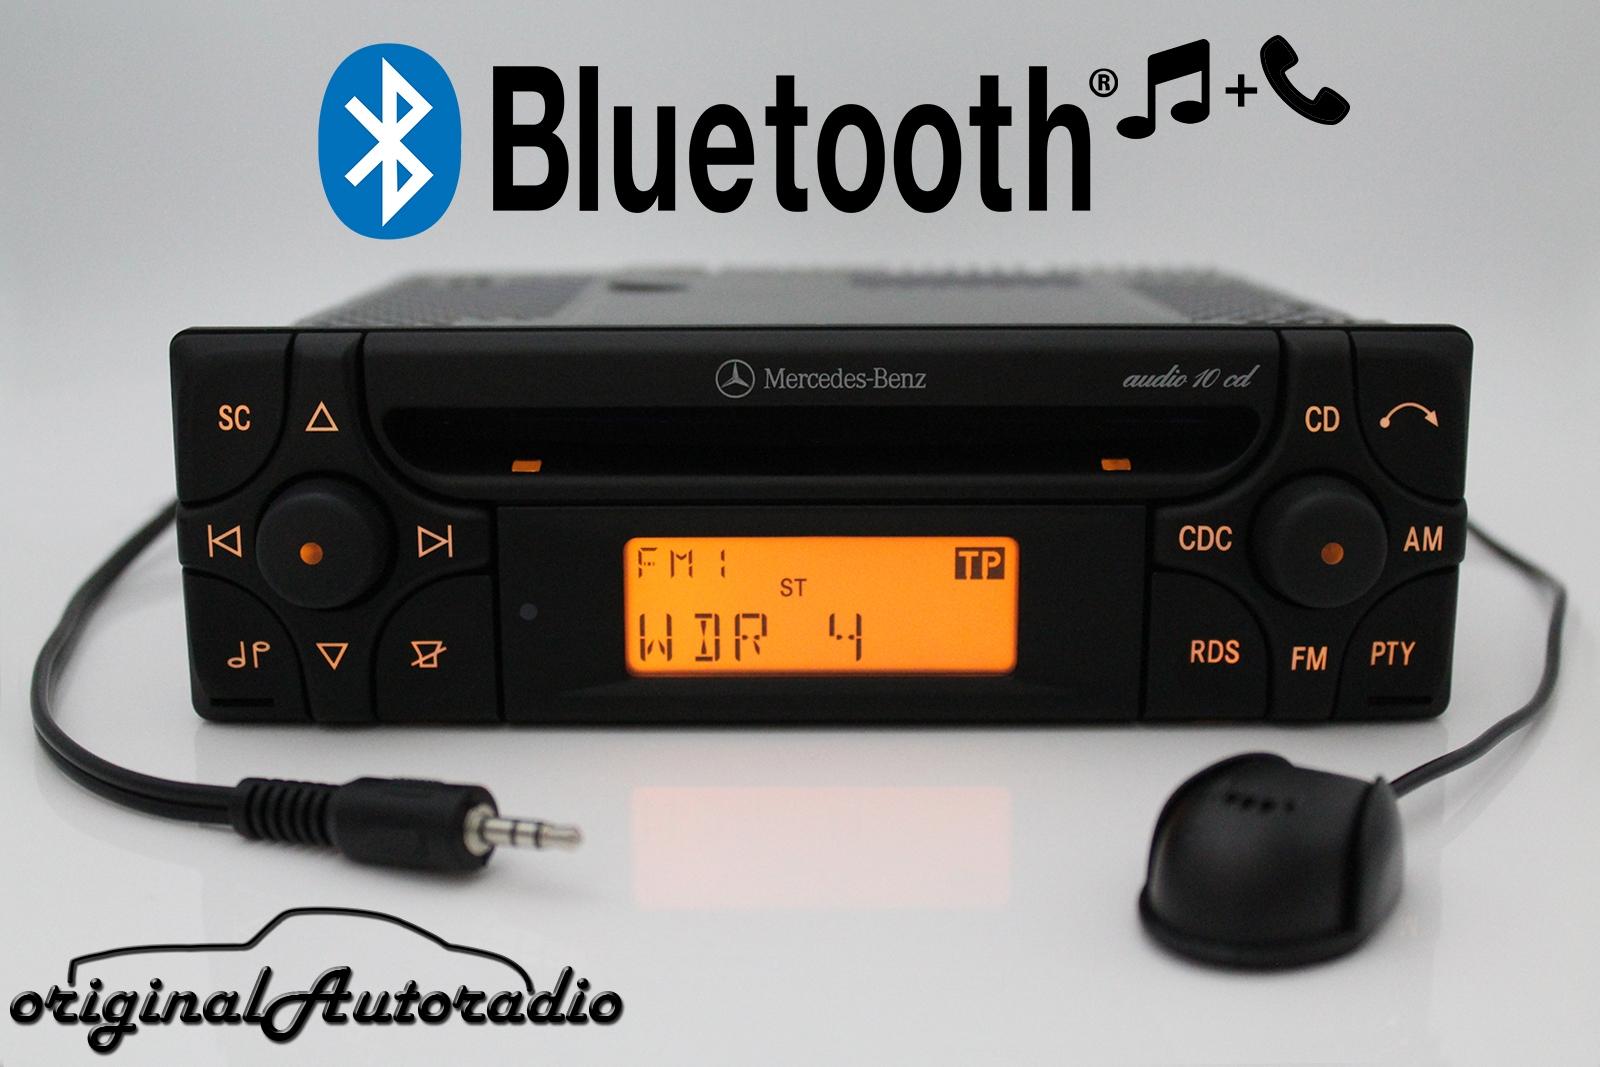 Original Autoradio De Mercedes Audio 10 Cd Mf2910